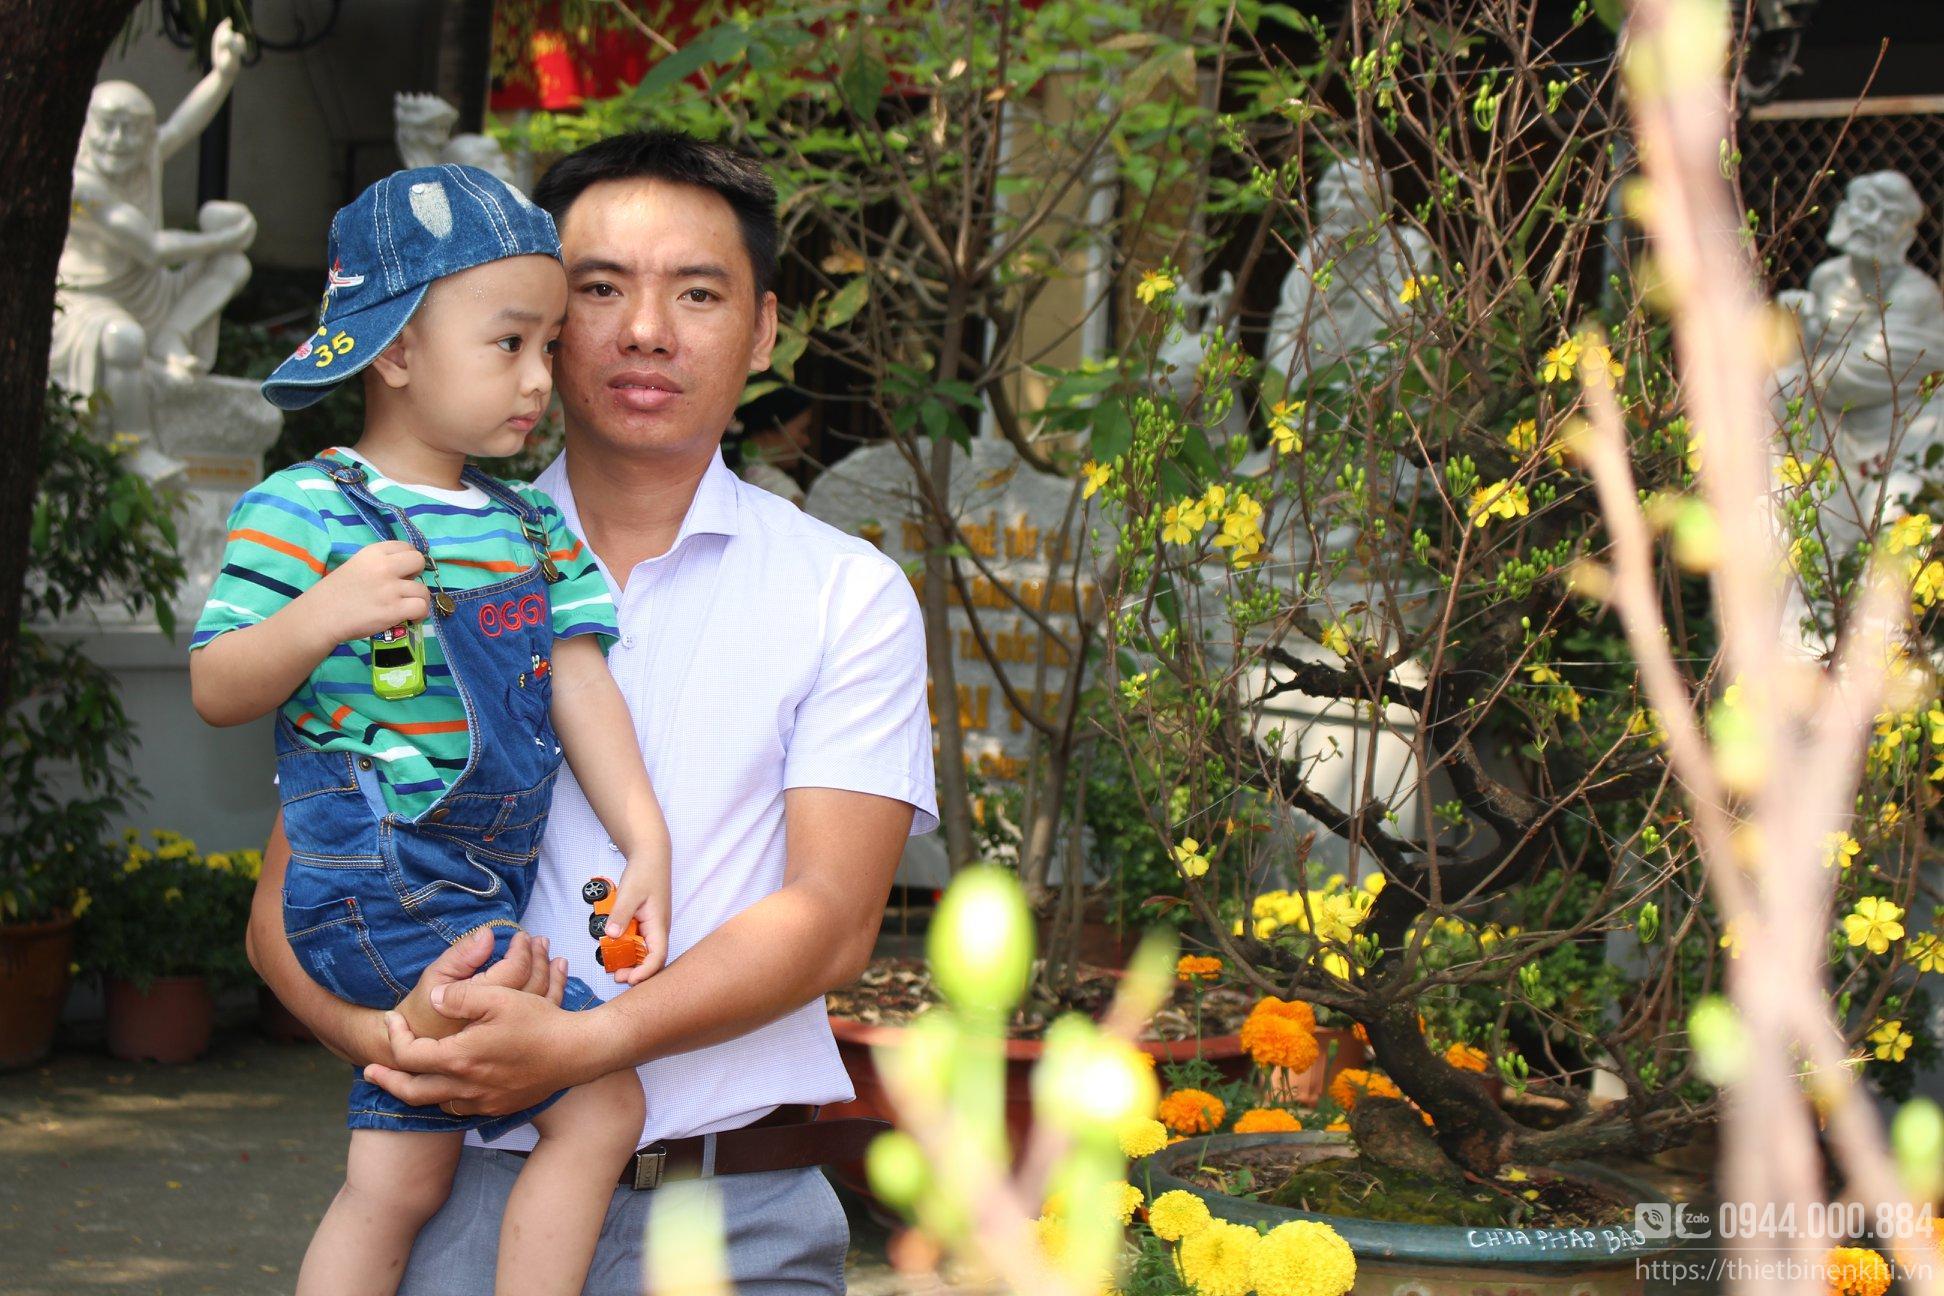 Nguyễn Văn Thái